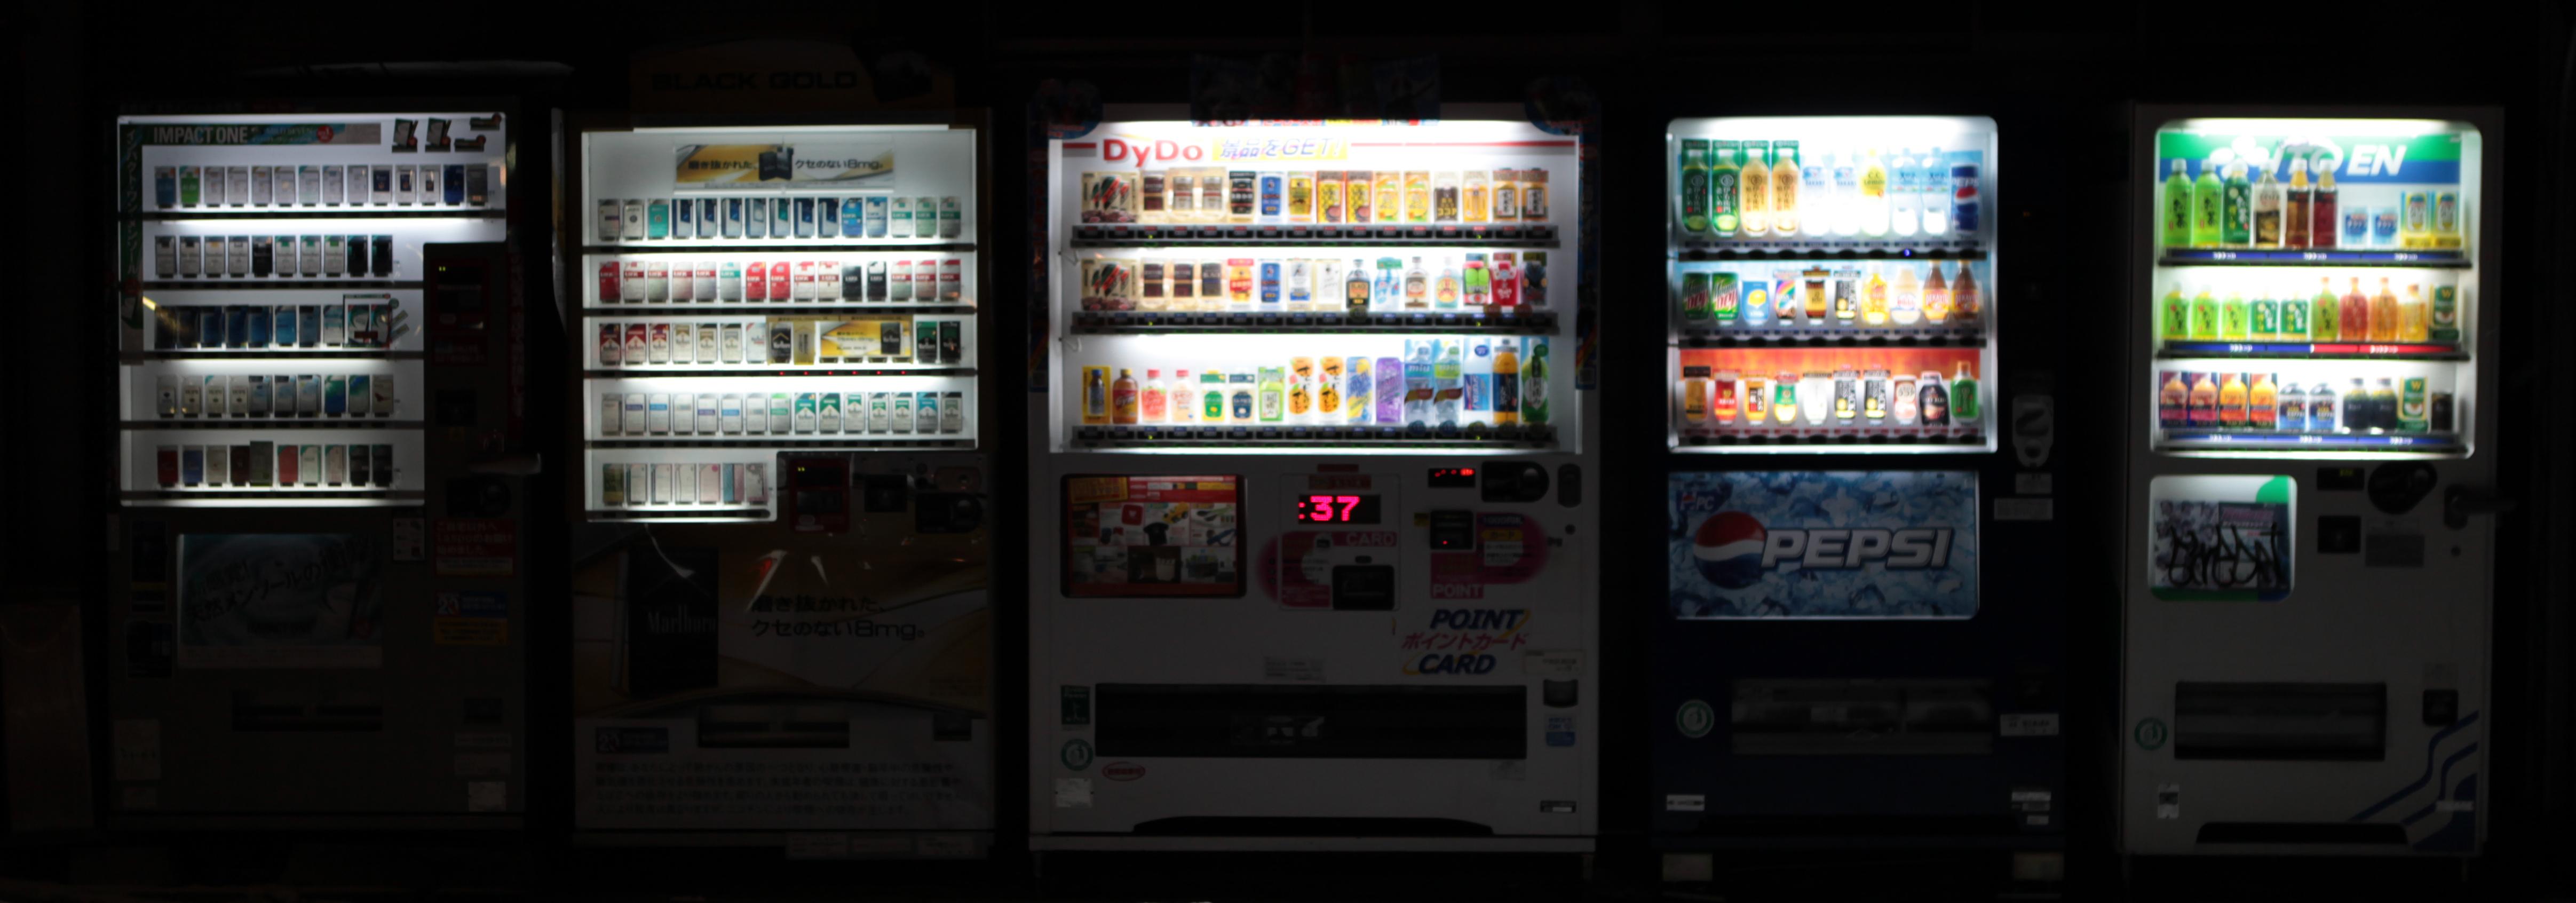 Sapporo vending machines